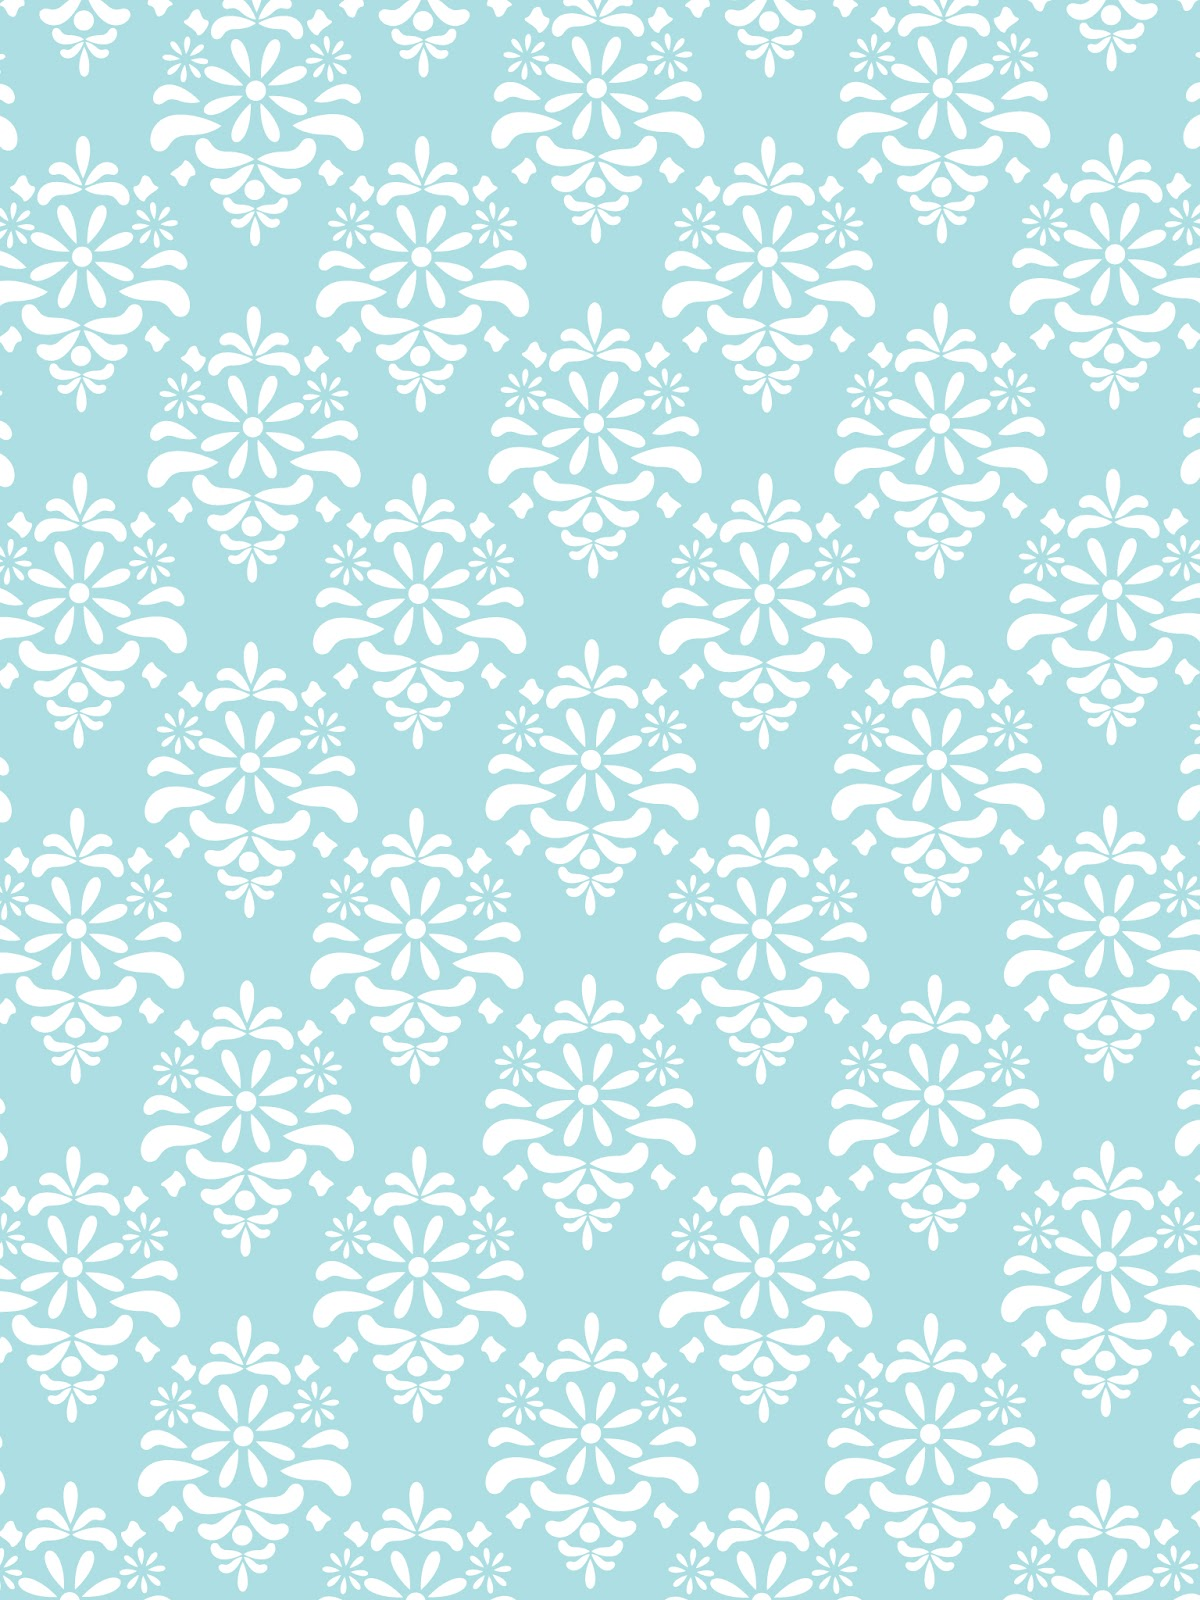 Julesoca Blog Damask Wallpaper Light Blue Gray Pink